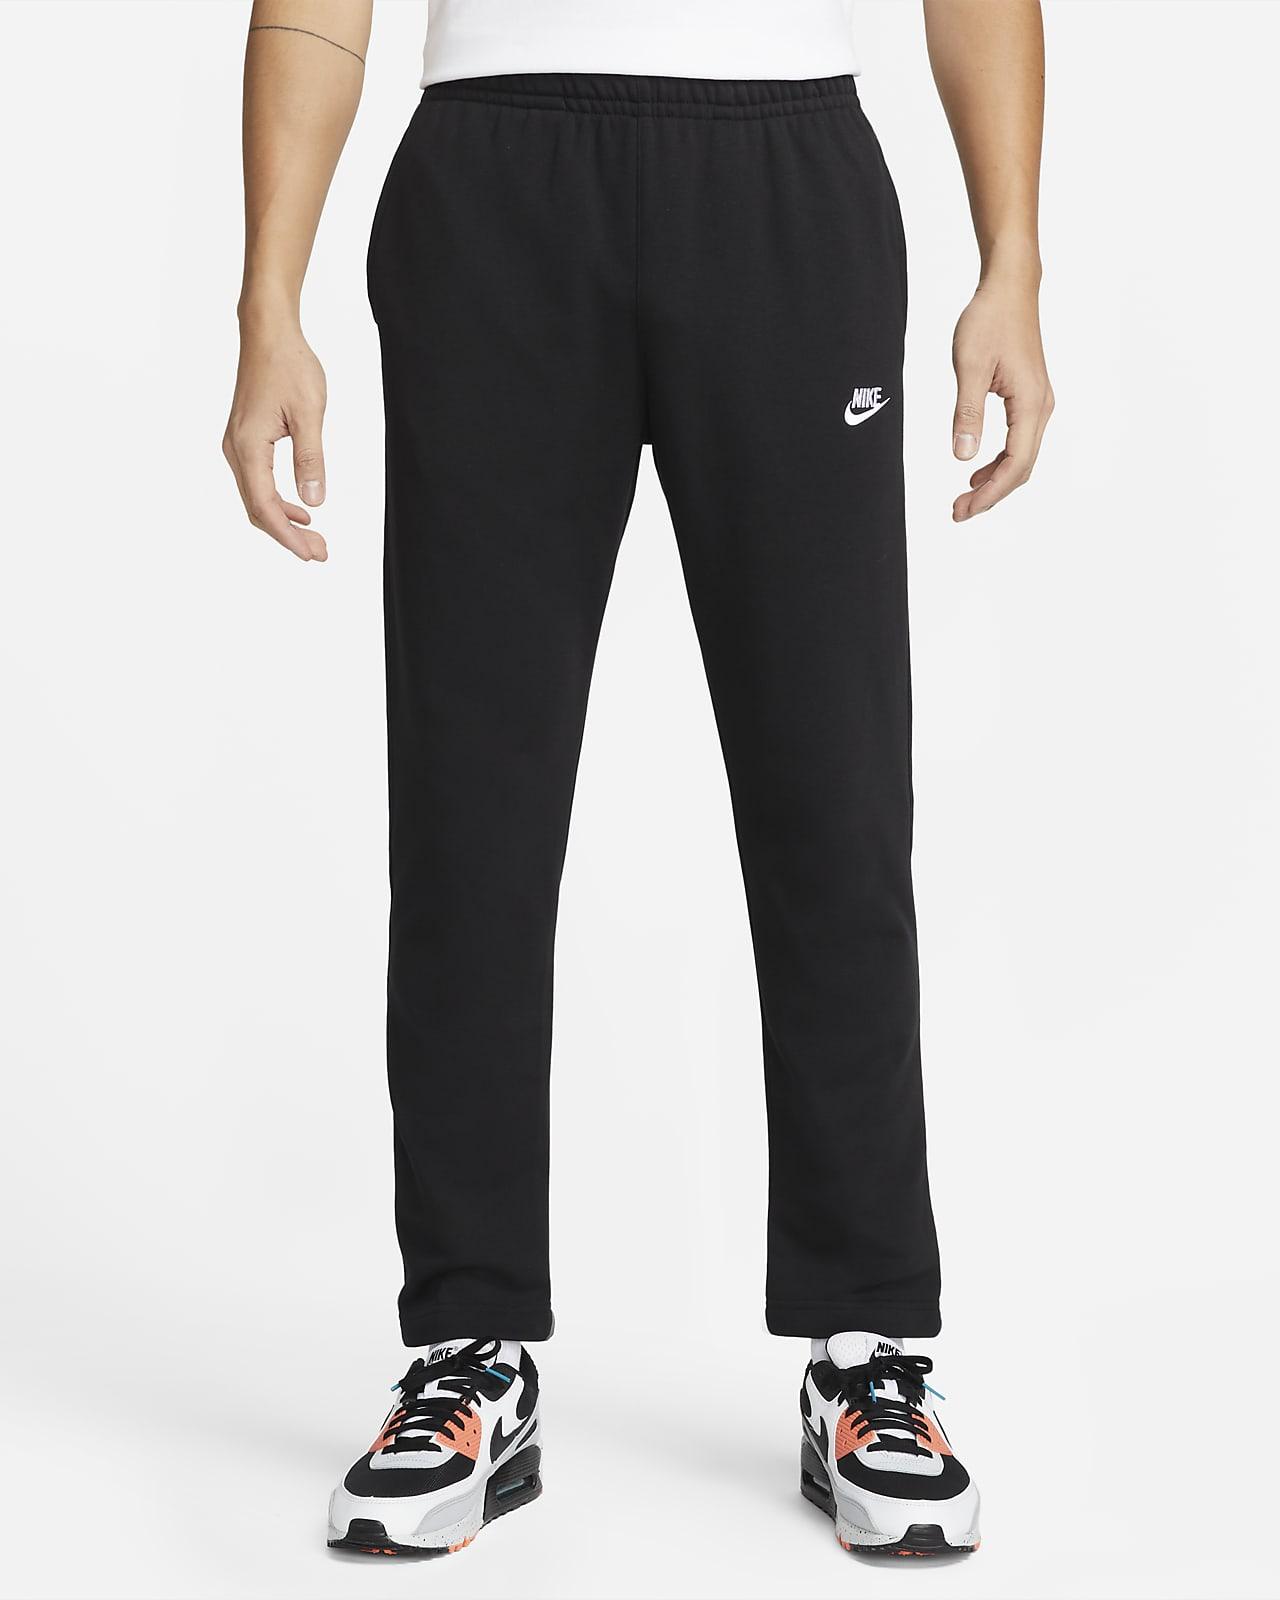 Nike Sportswear Club 男款法國毛圈布長褲